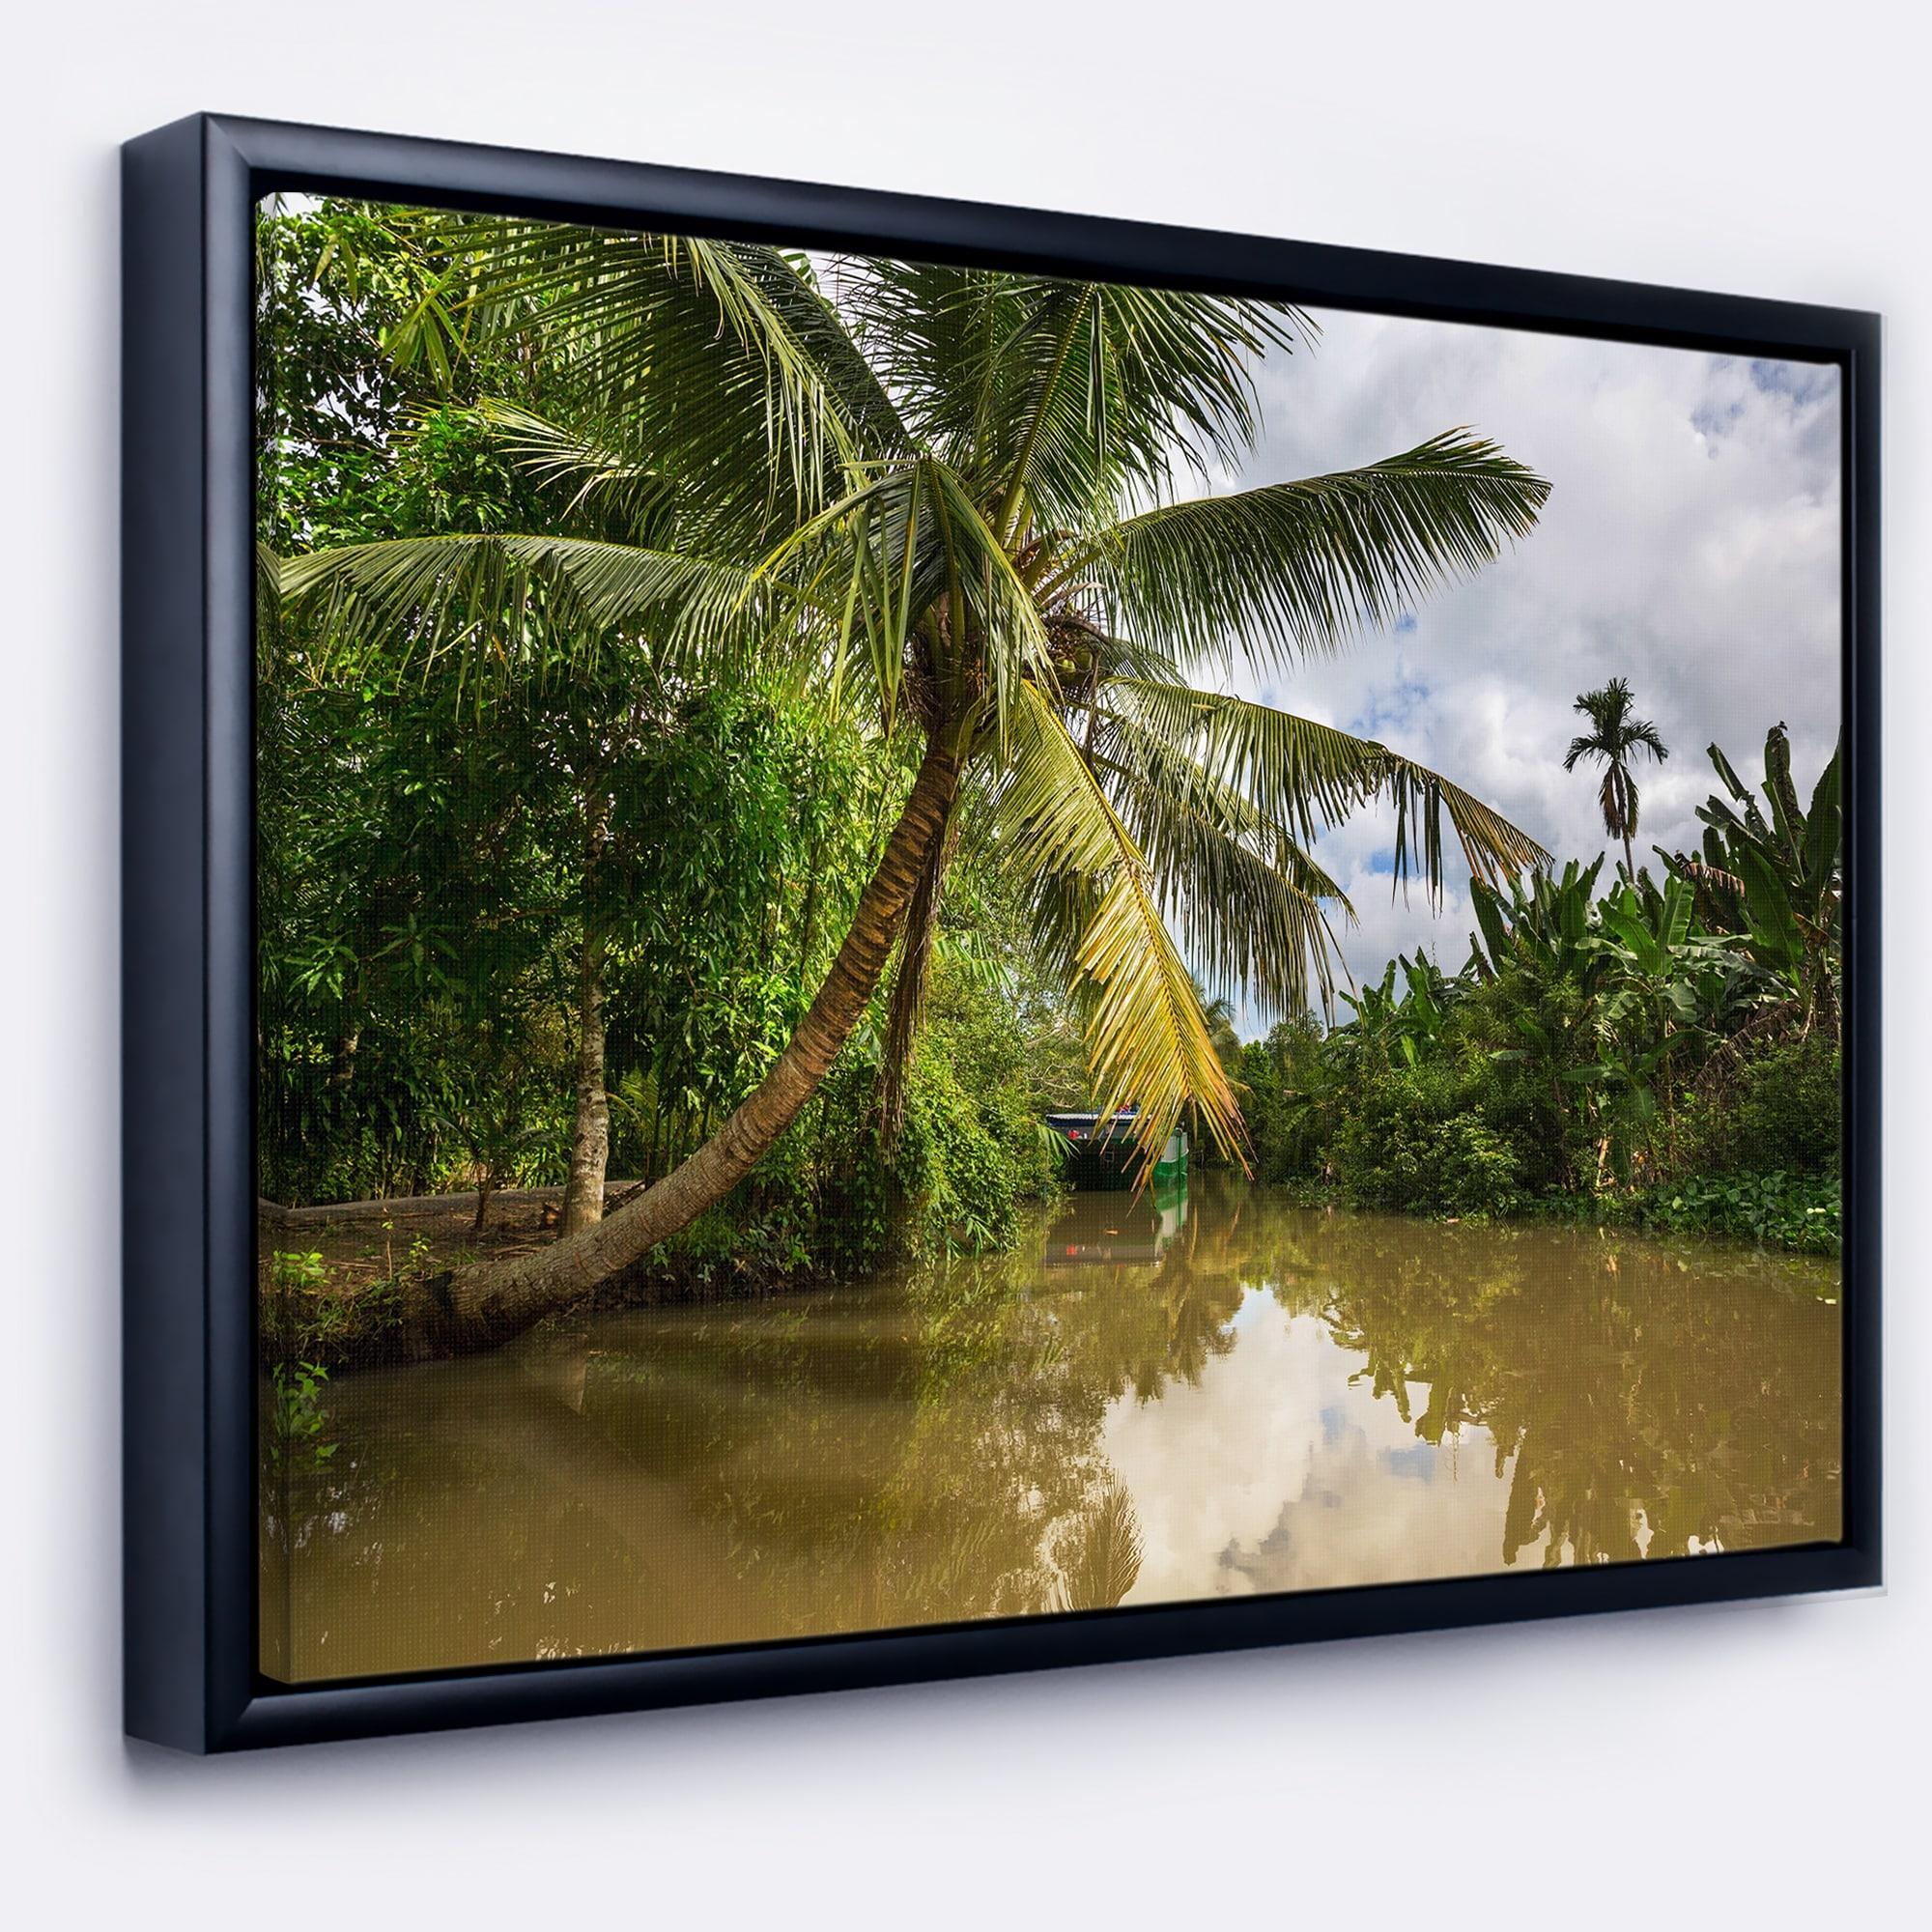 Designart Tropical River With Bent Coconut Palm Oversized Landscape Framed Canvas Art Overstock 18959101